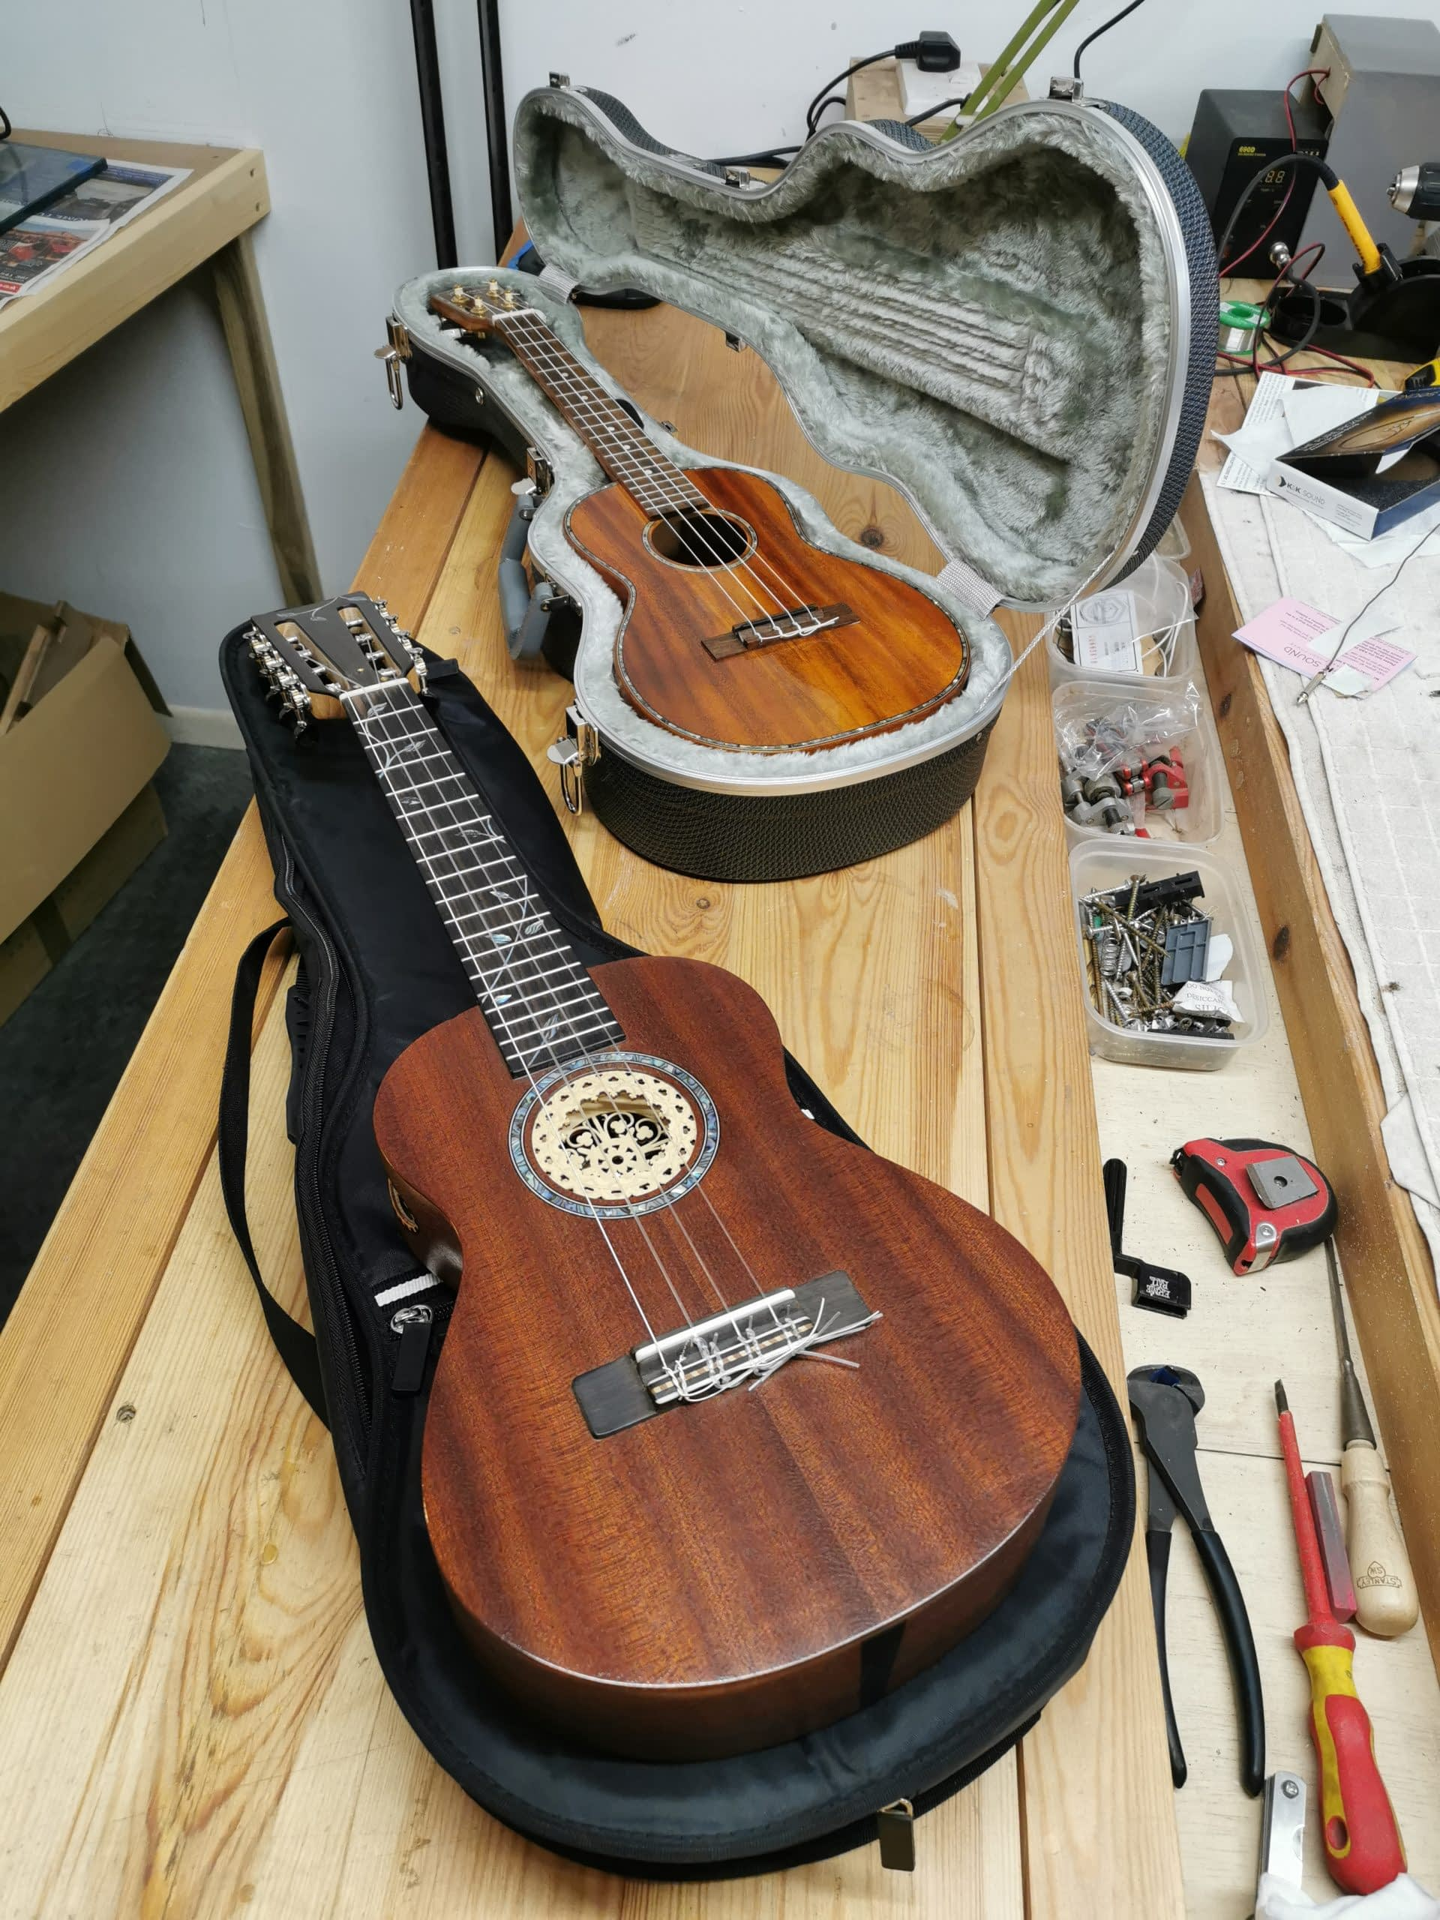 Pair of Handmade Ukuleles guitar repair stroud